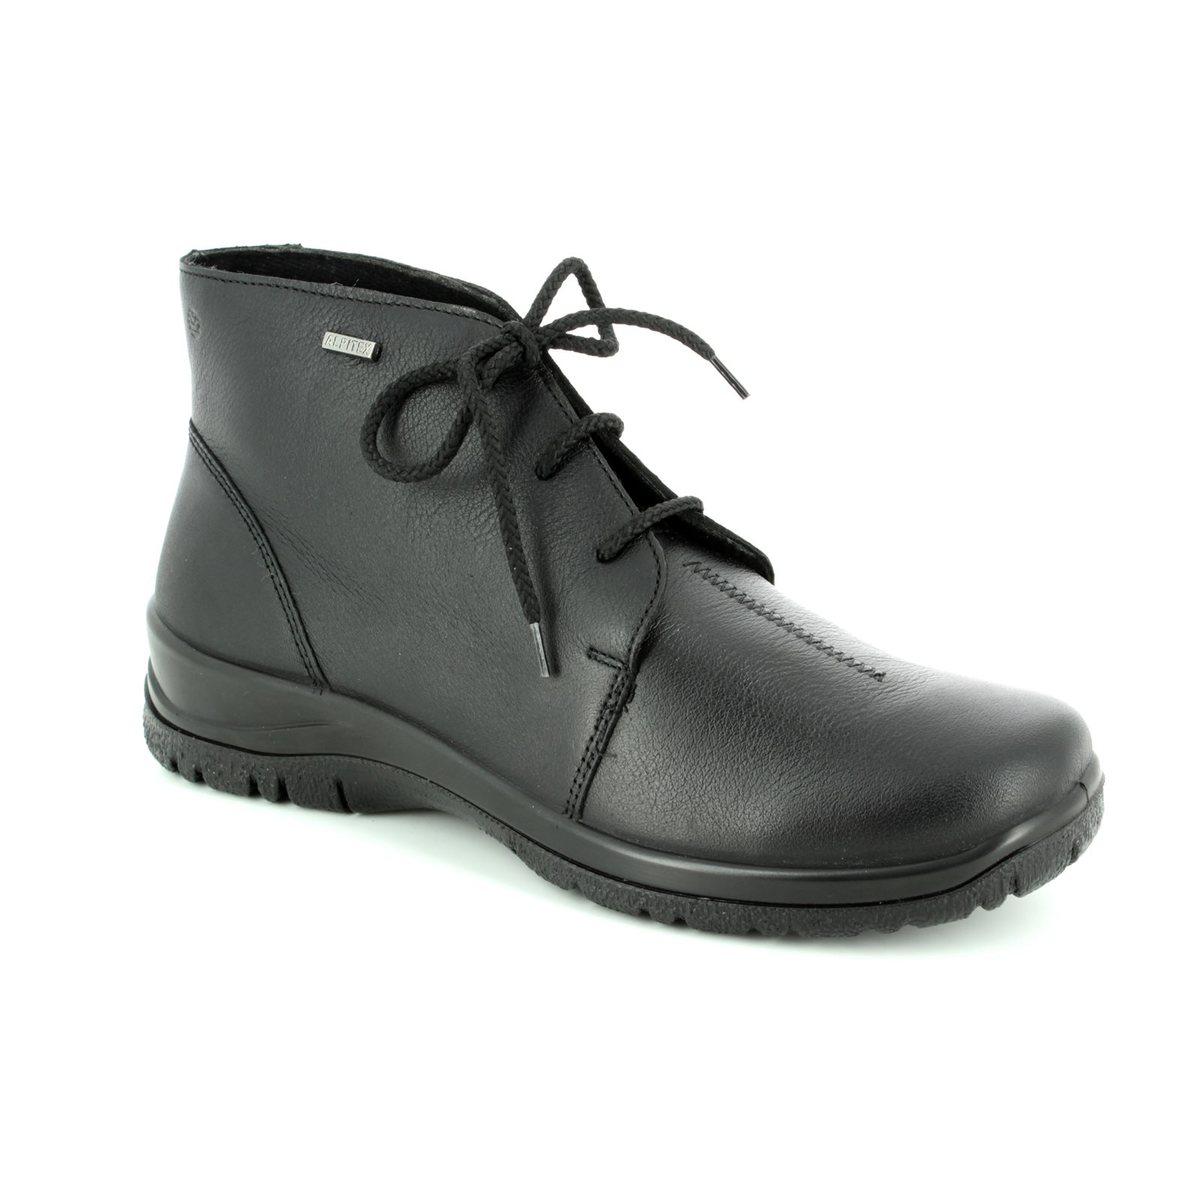 Alpina Ronyboot Tex R Black Ankle Boots - Alpina boot